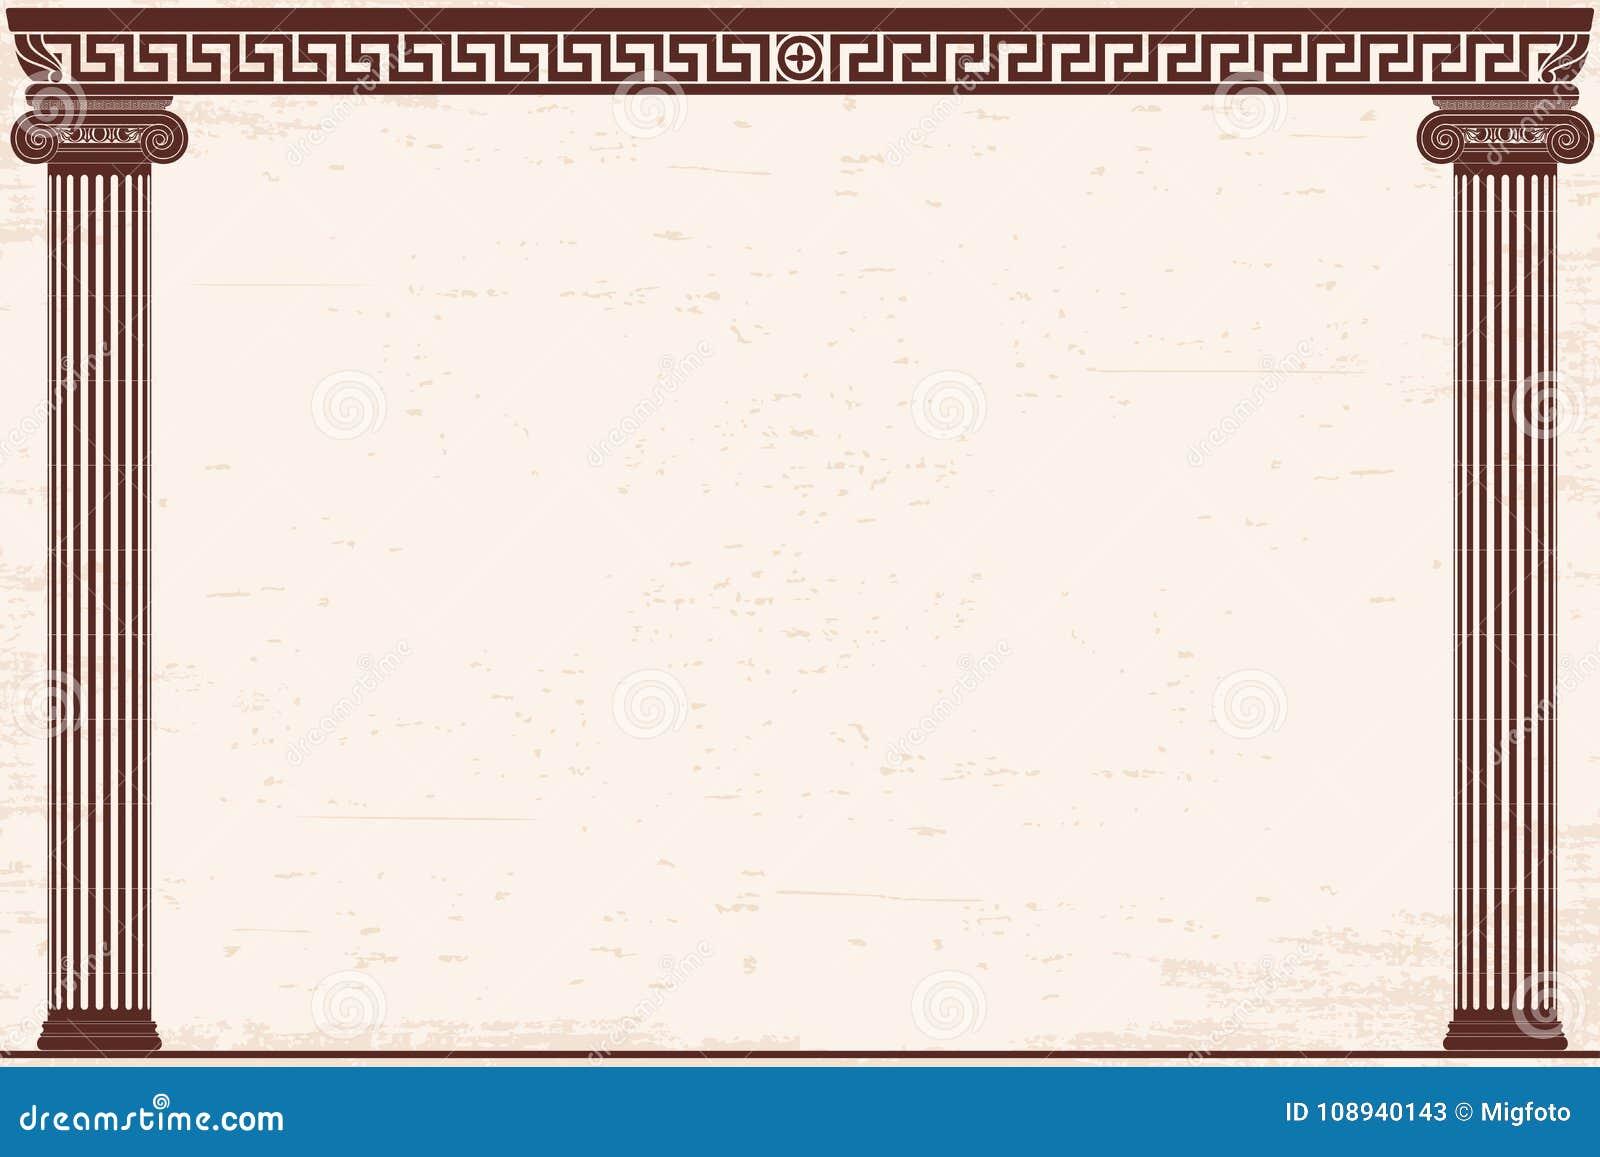 Ancient Greece gold white wallpaper - scrummy - Spoonflower   Ancient Greece Wallpaper Designs